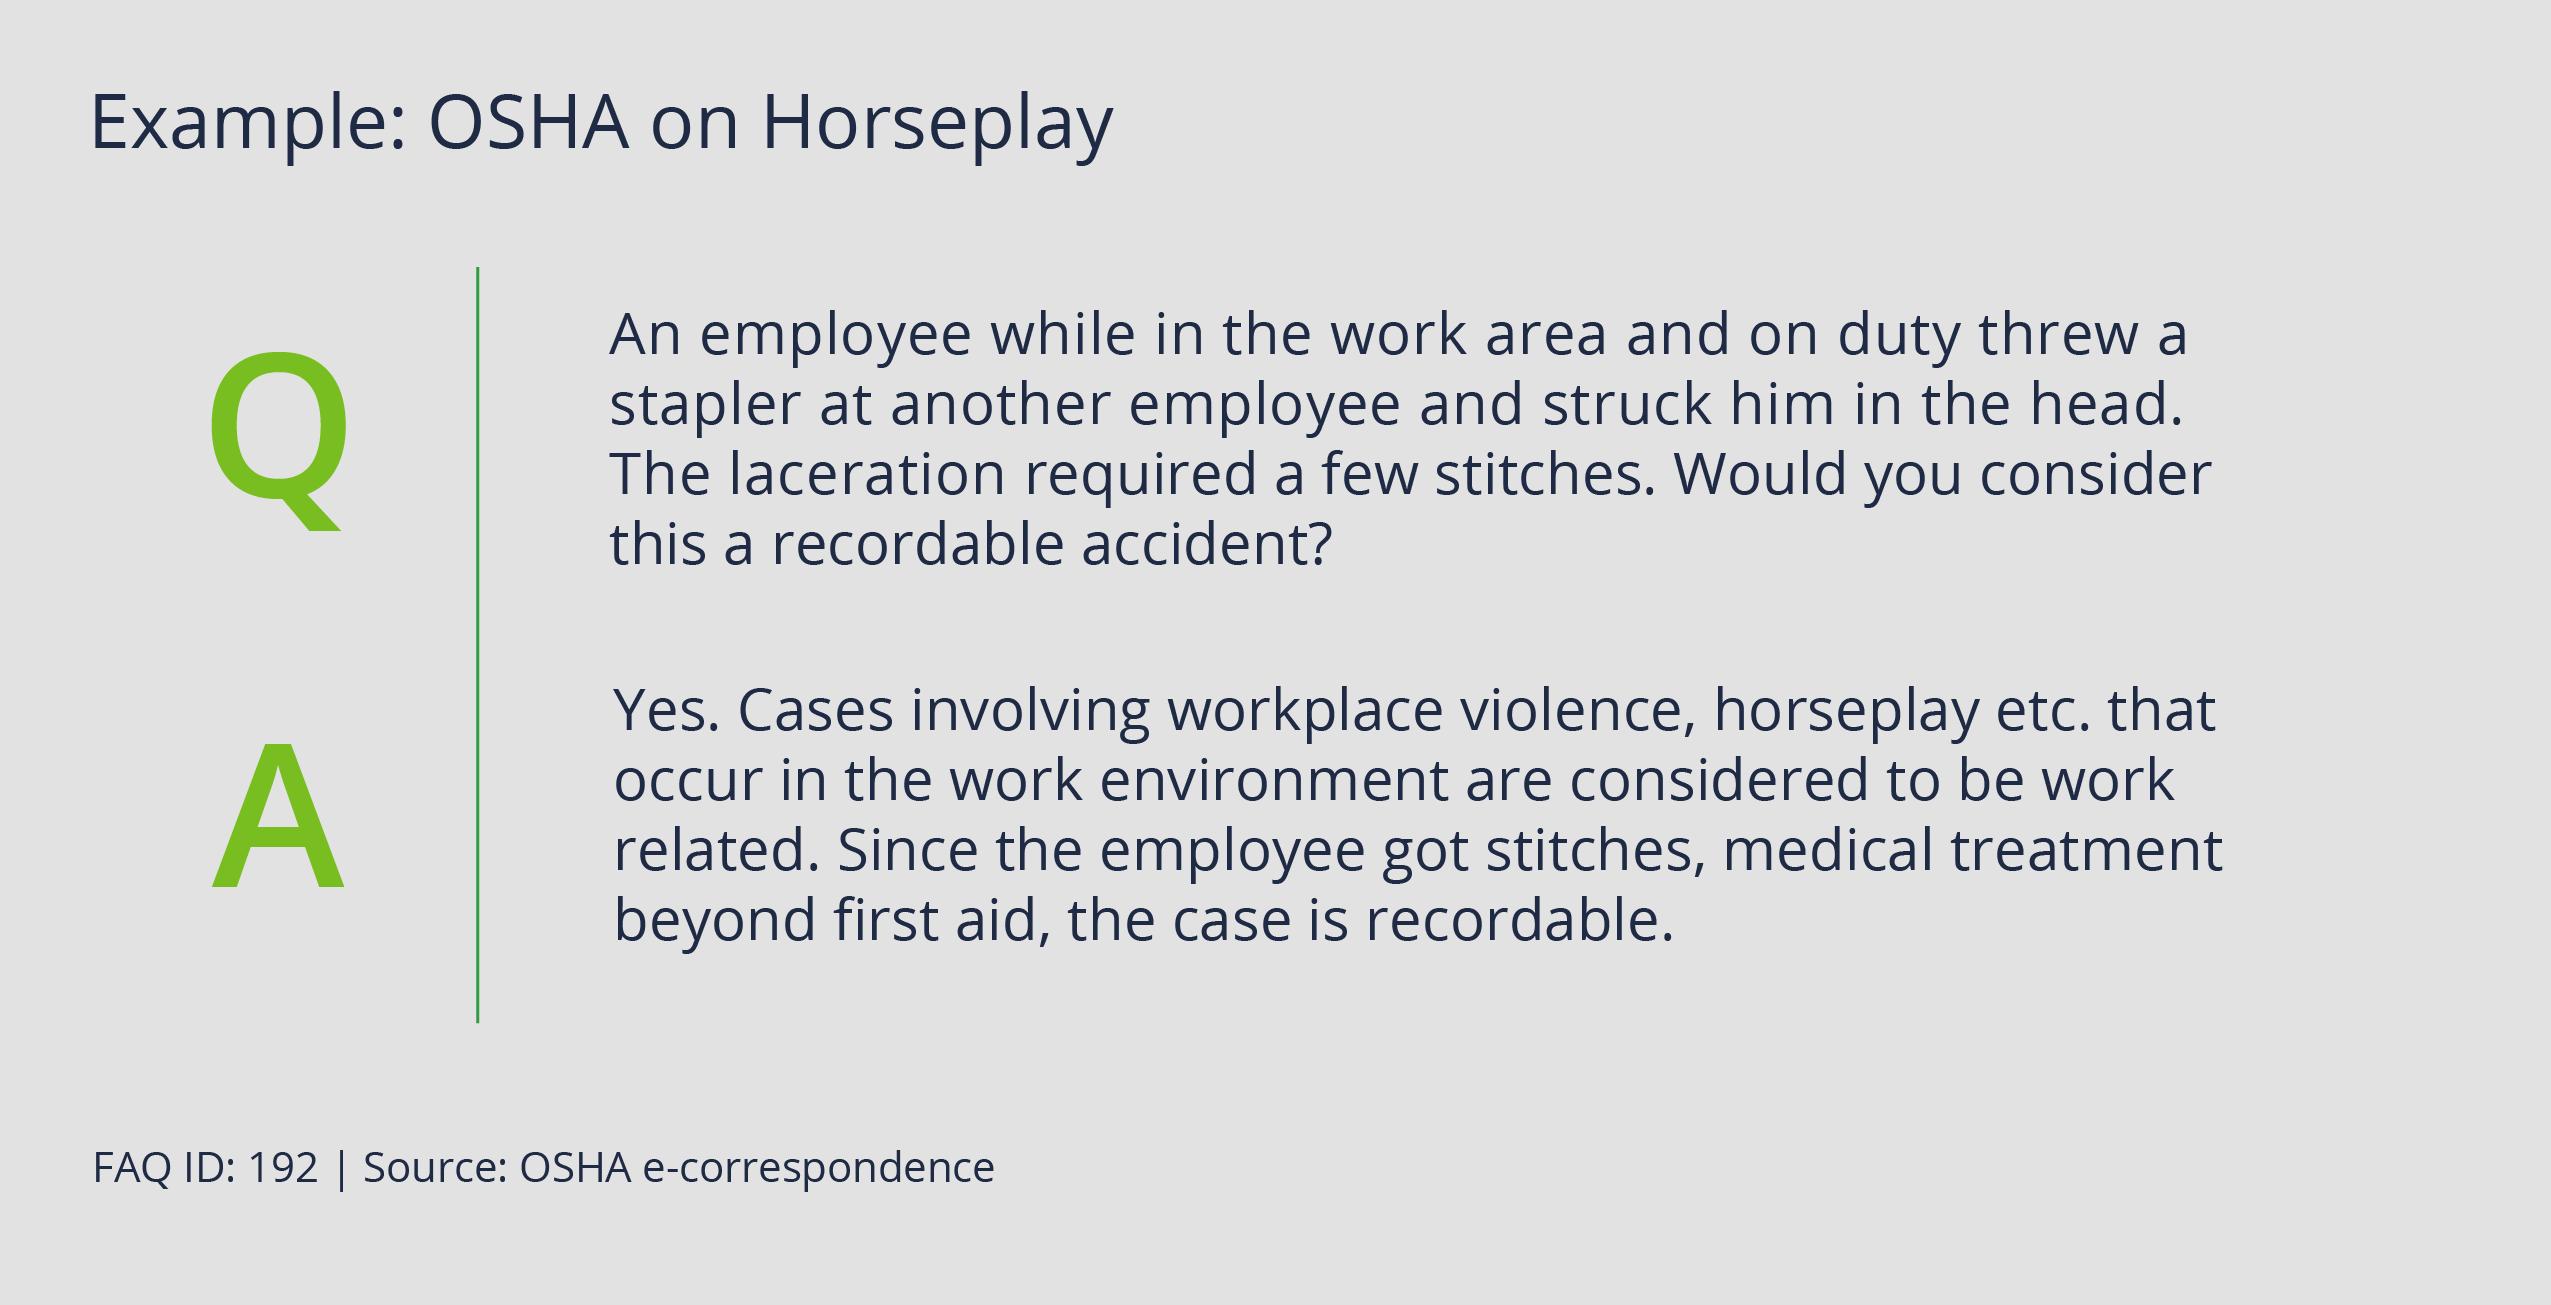 OSHA on Horseplay